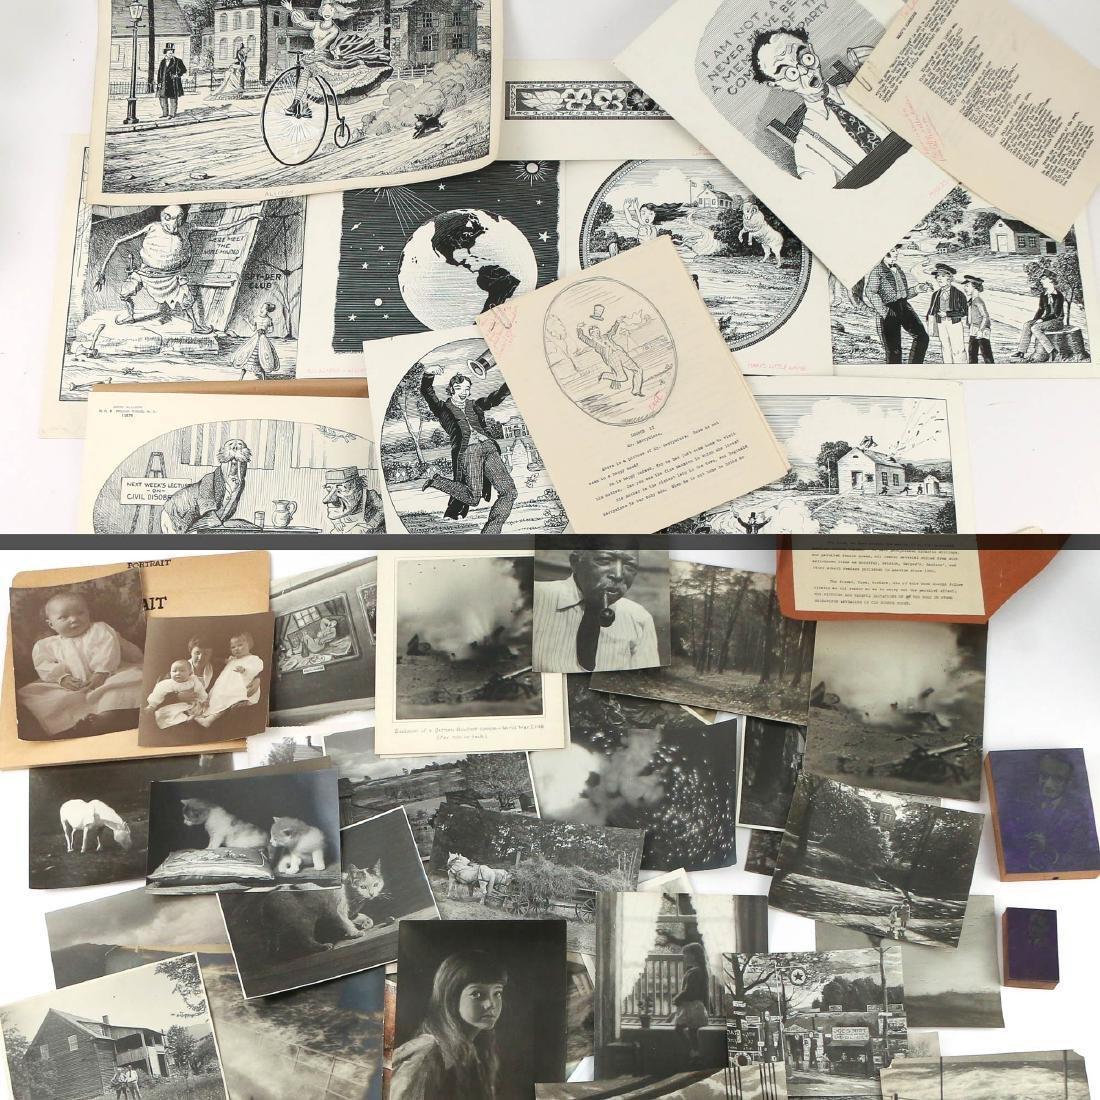 JOHN ALLISON DRAWINGS, PHOTOGRAPHS, & OTHER